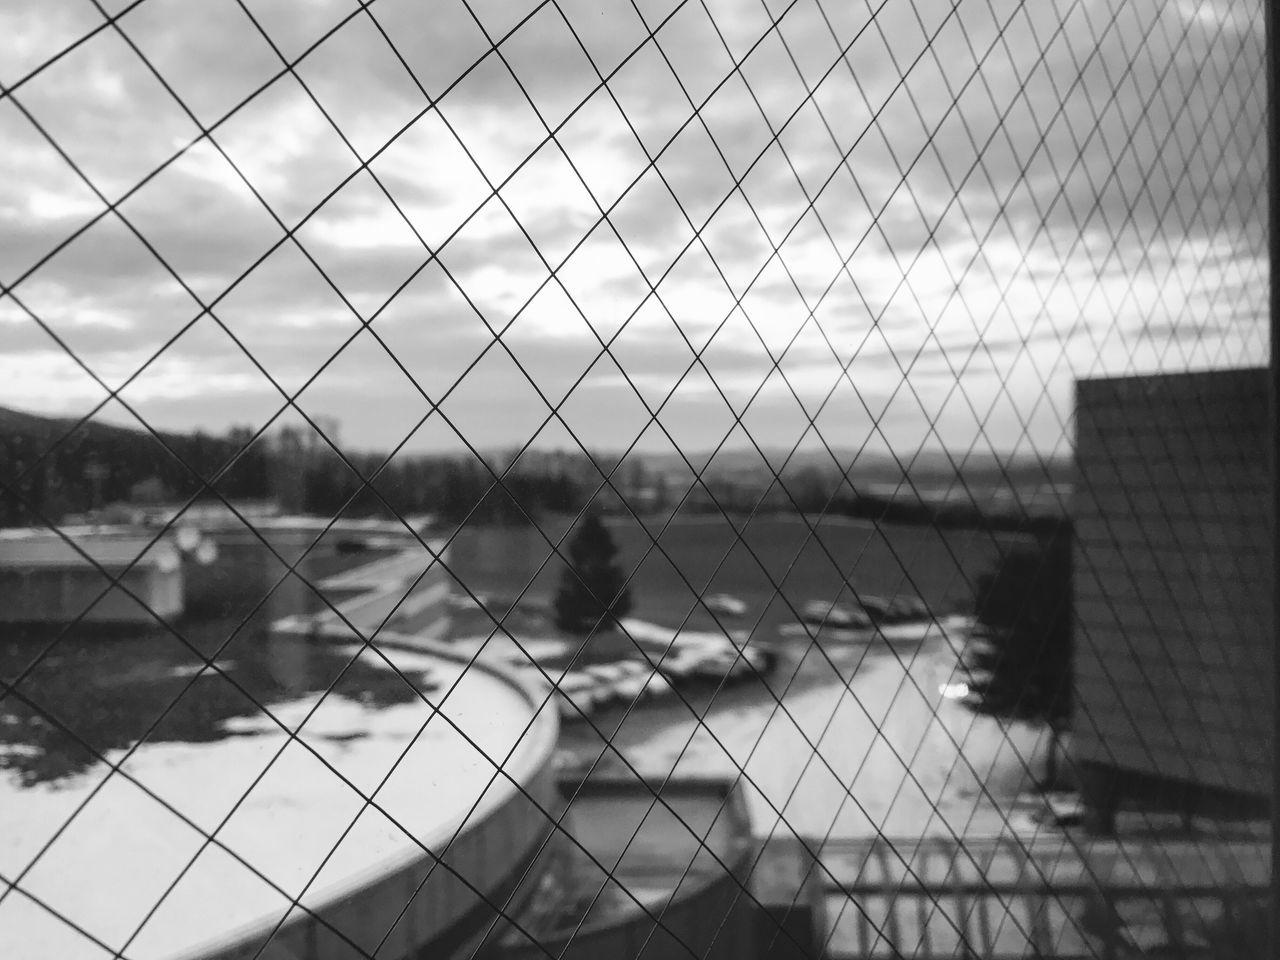 Buildings Seen Through Chainlink Fence Against Cloudy Sky